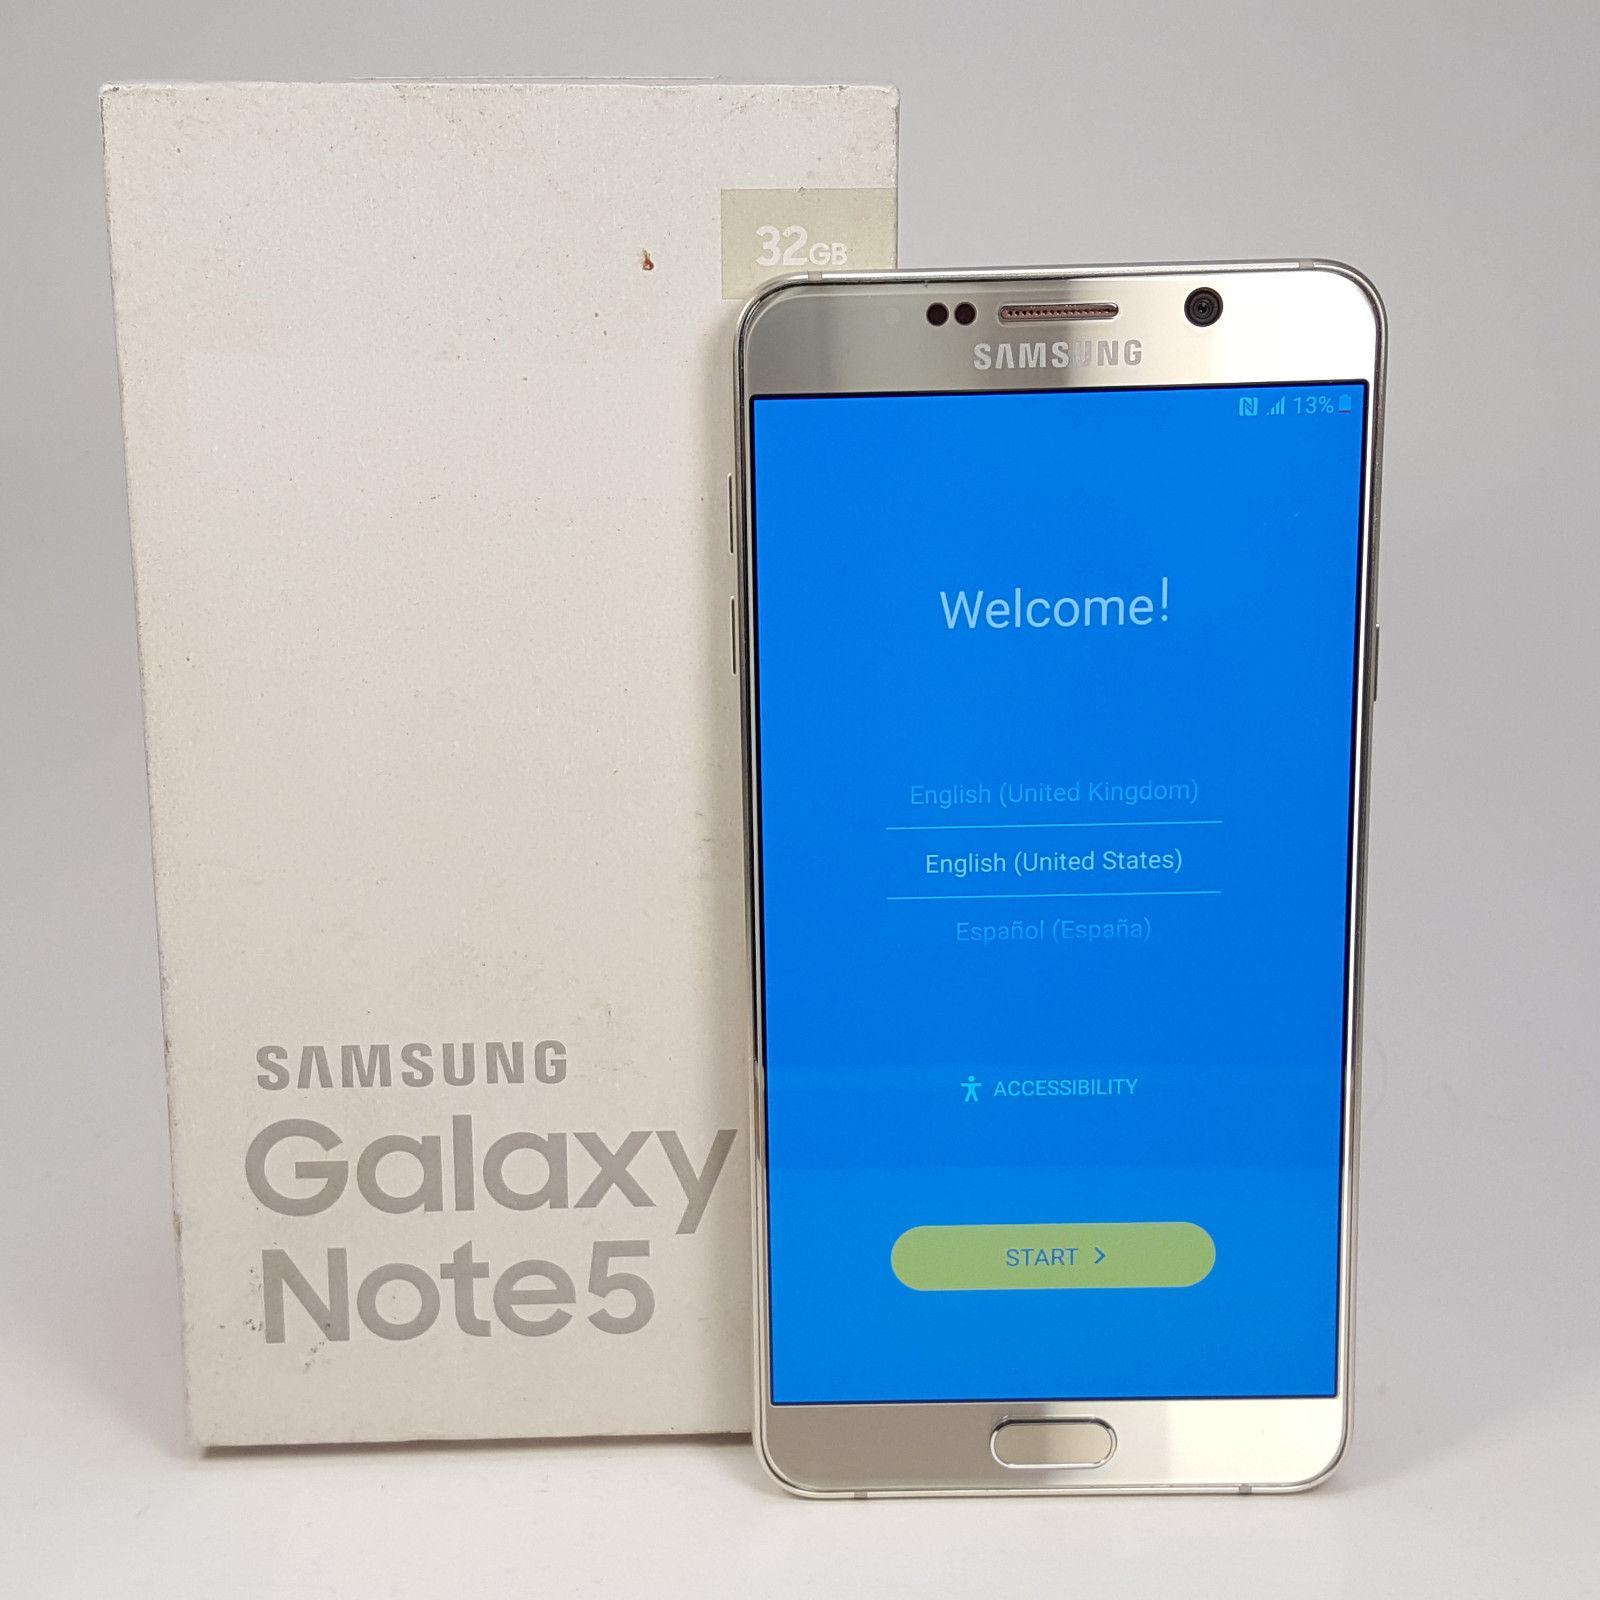 Samsung Galaxy Note 5 4 S5 Factory Unlocked Sim Free Smartphone